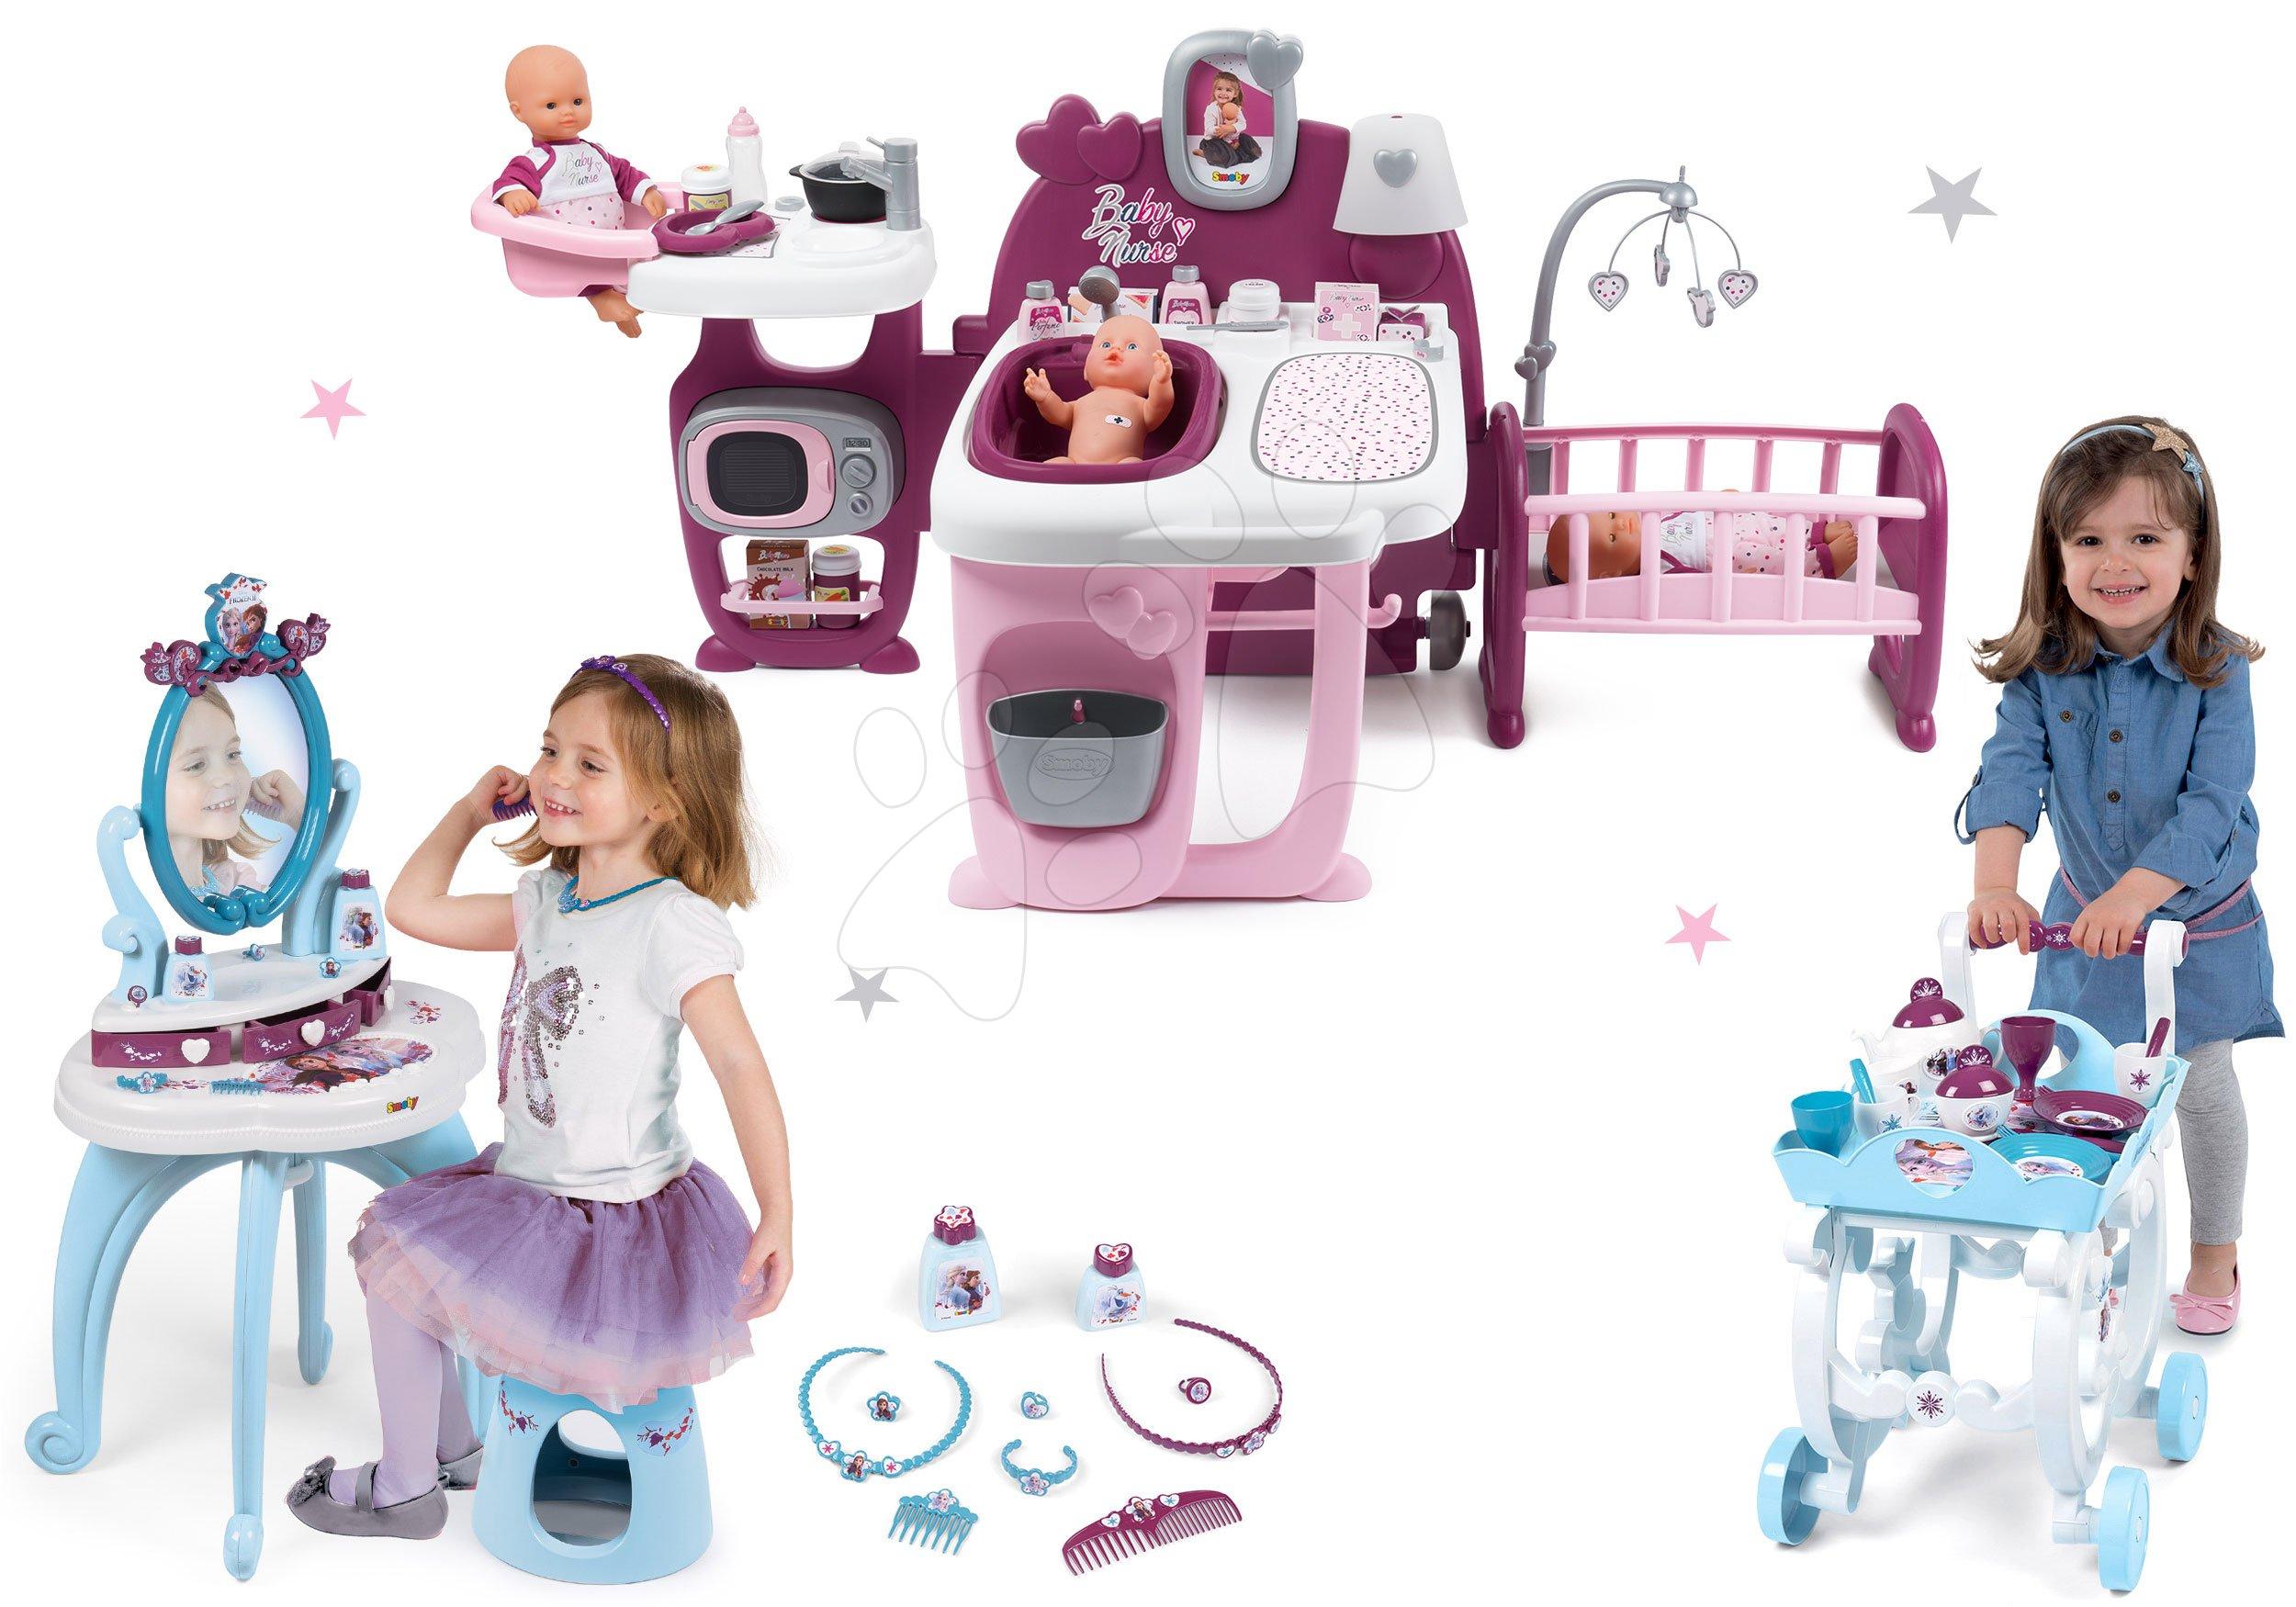 Smoby set domček pre bábiku Baby Nurse Doll´s Play Center a kozmetický stolík Frozen a servírovací vozík 220327-13